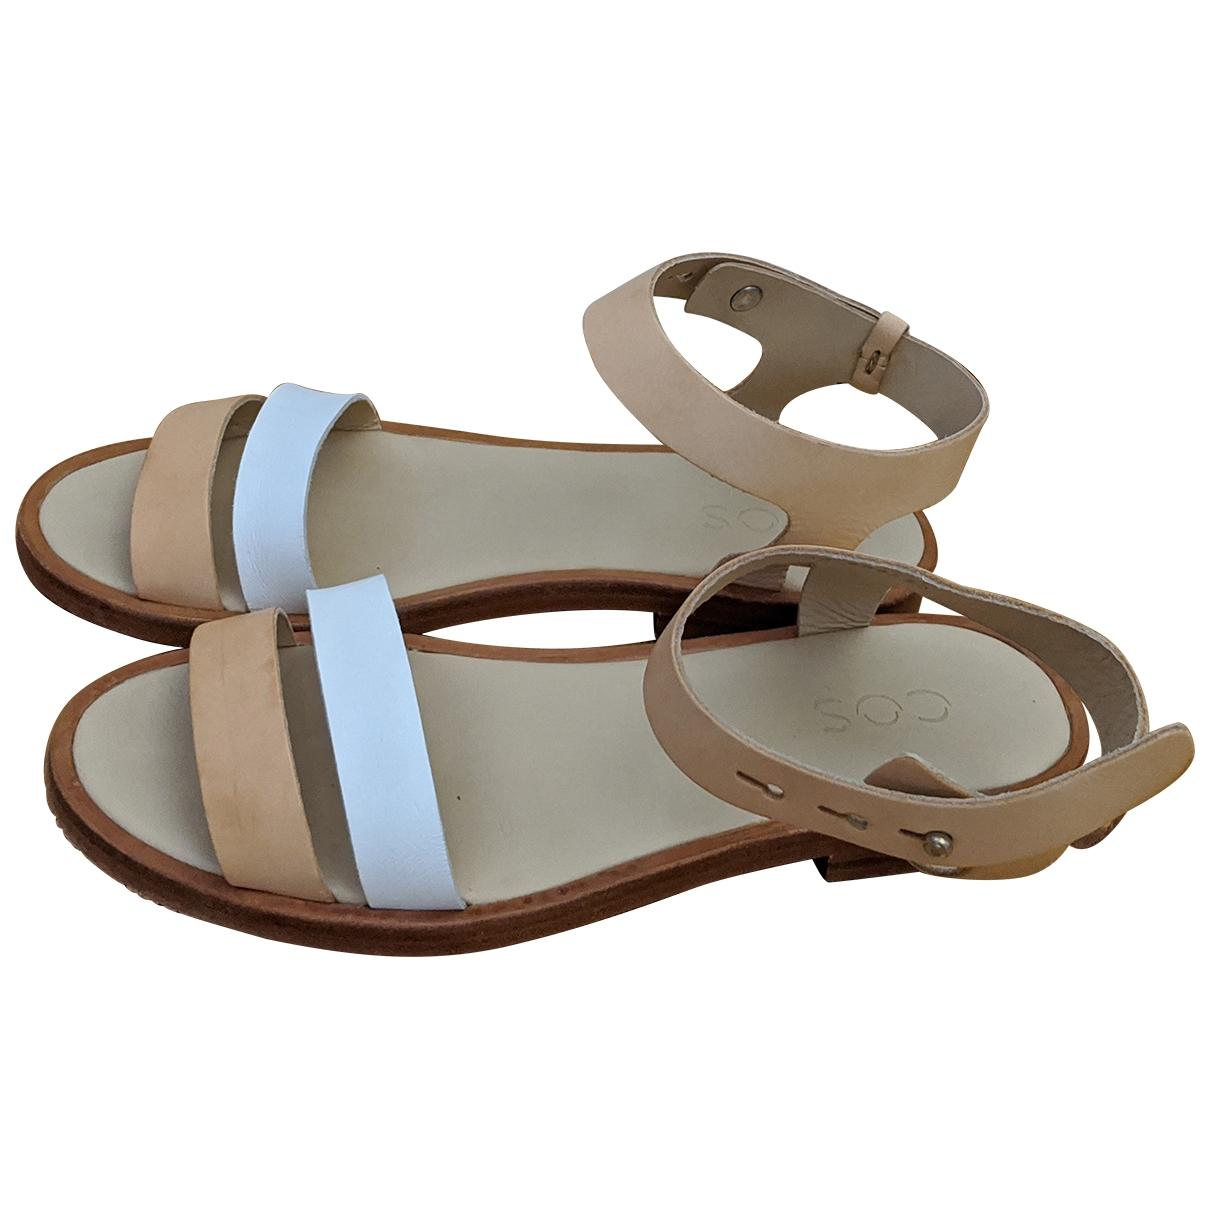 Cos \N Sandalen in  Beige Leder